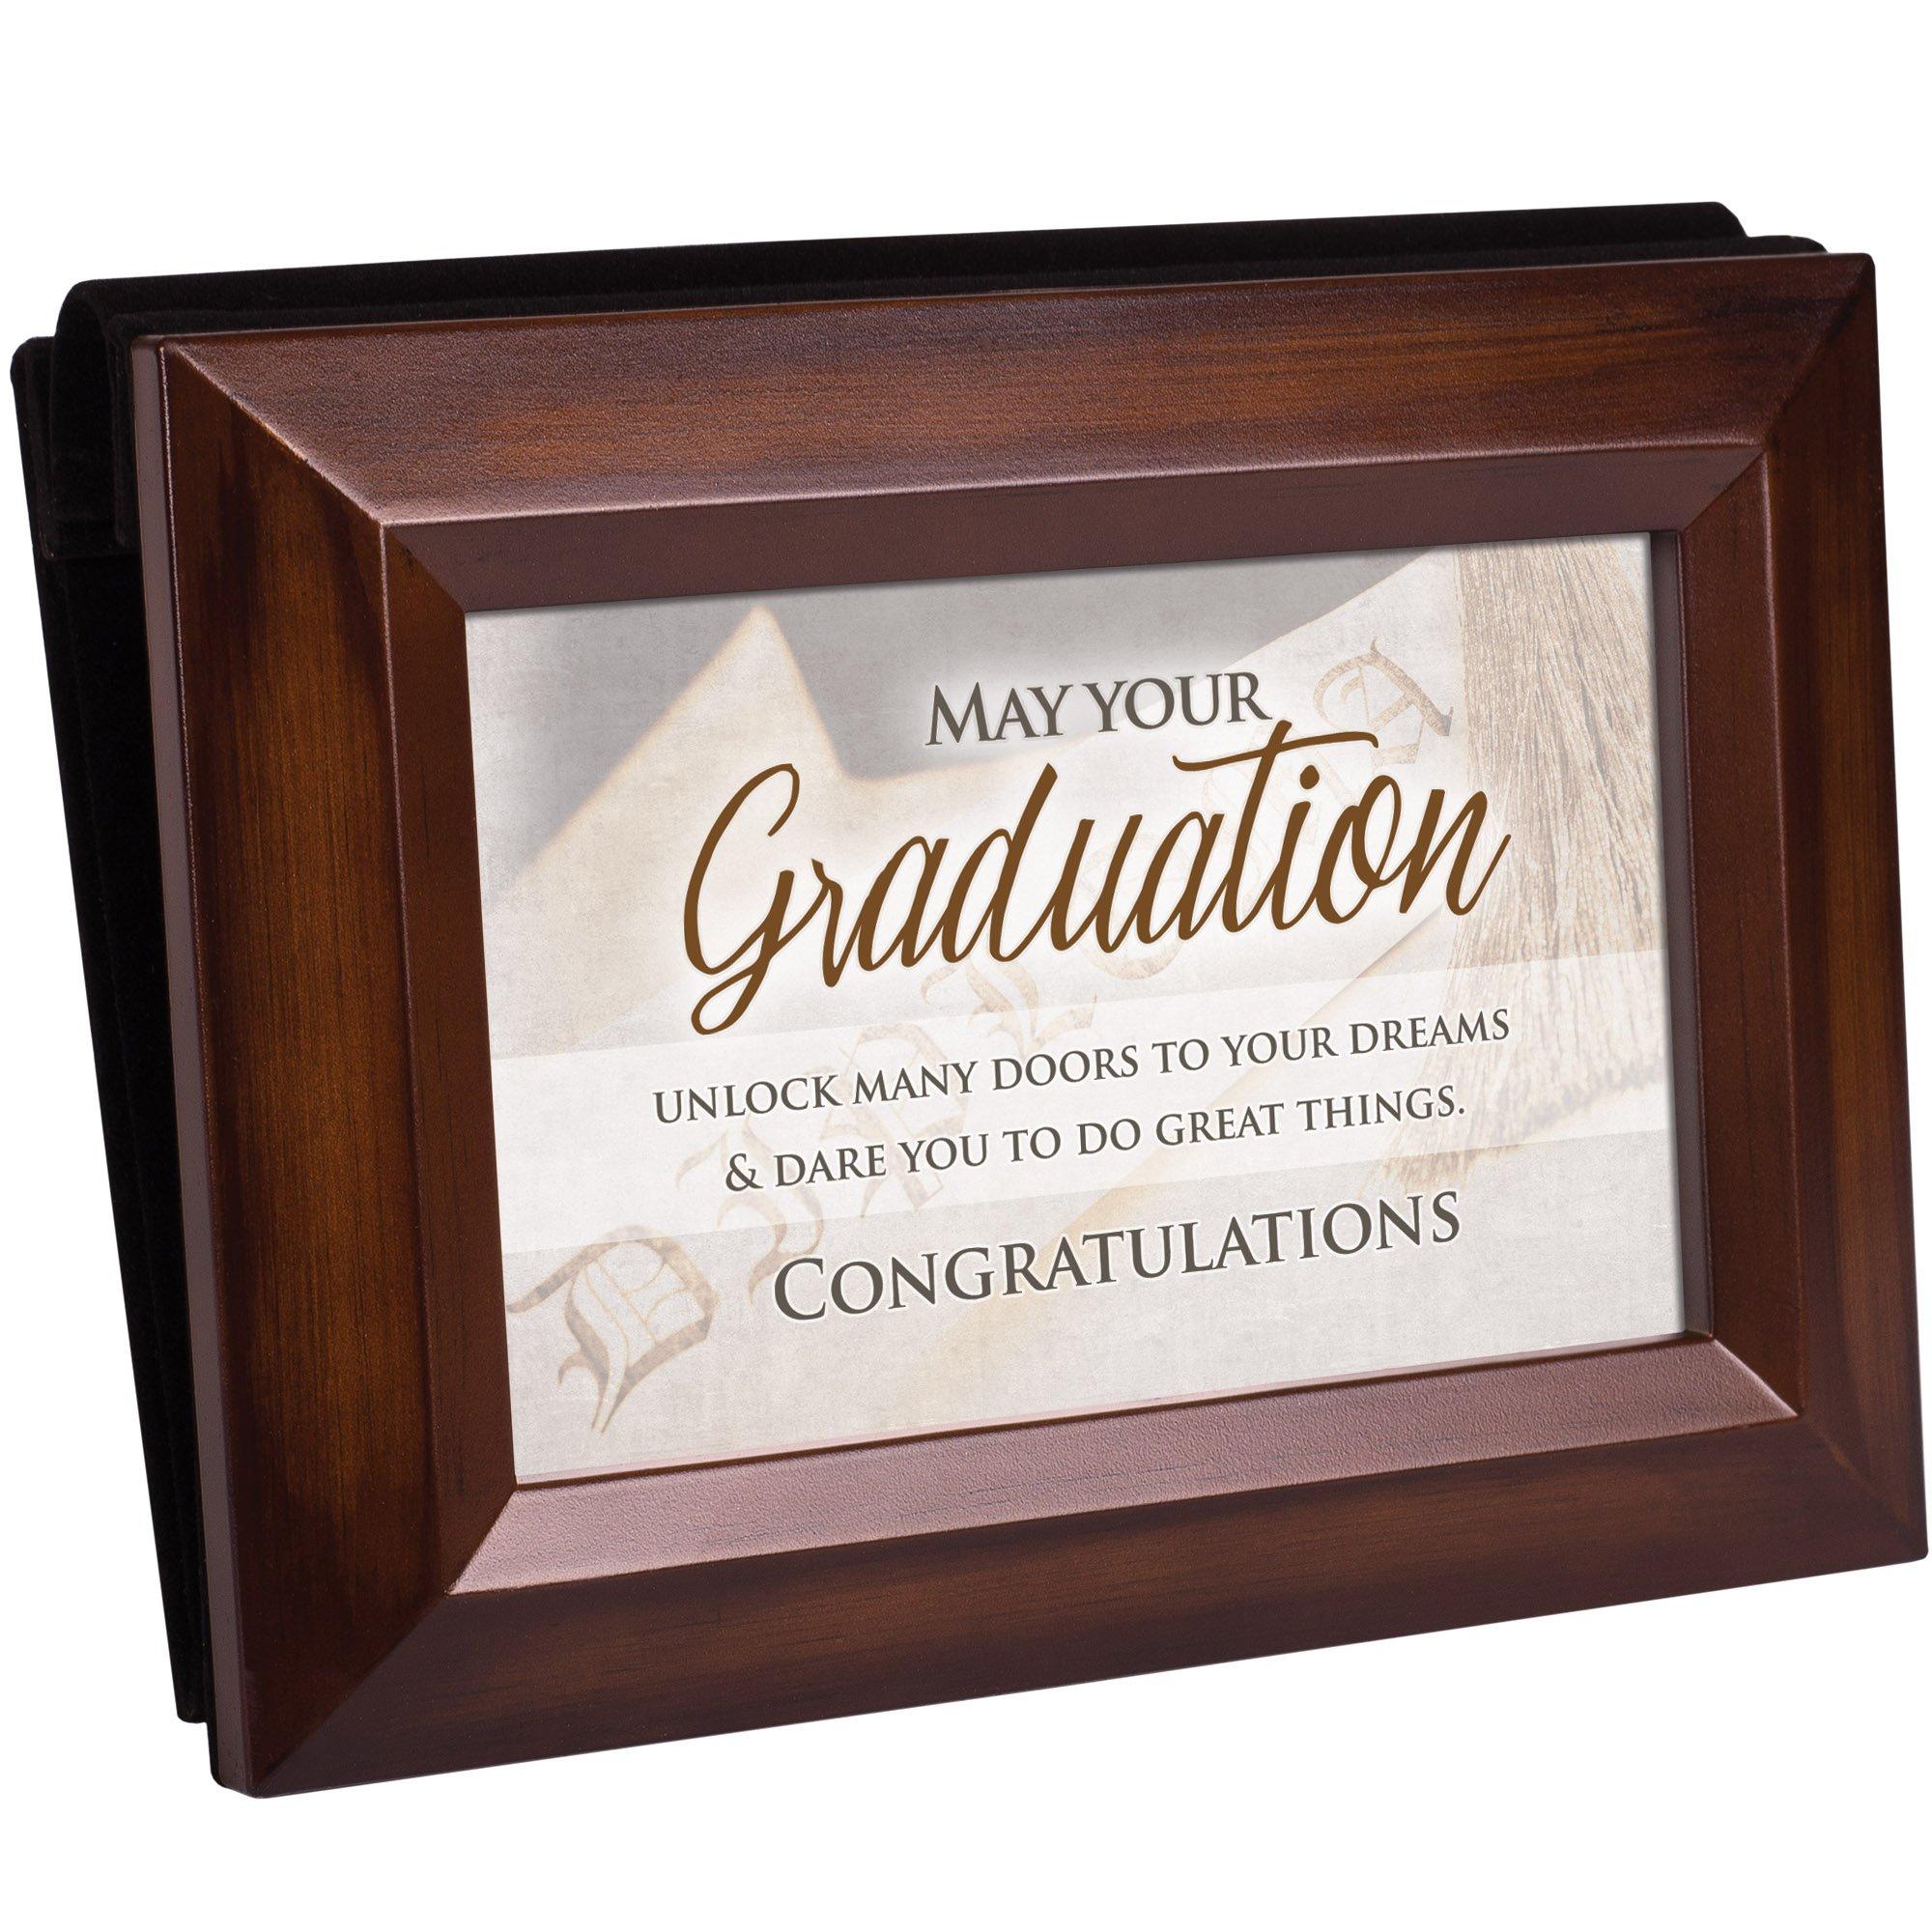 Your Graduation Congratulations Rich Walnut Wood 4 x 6 Table Top Photo Frame Picture Album